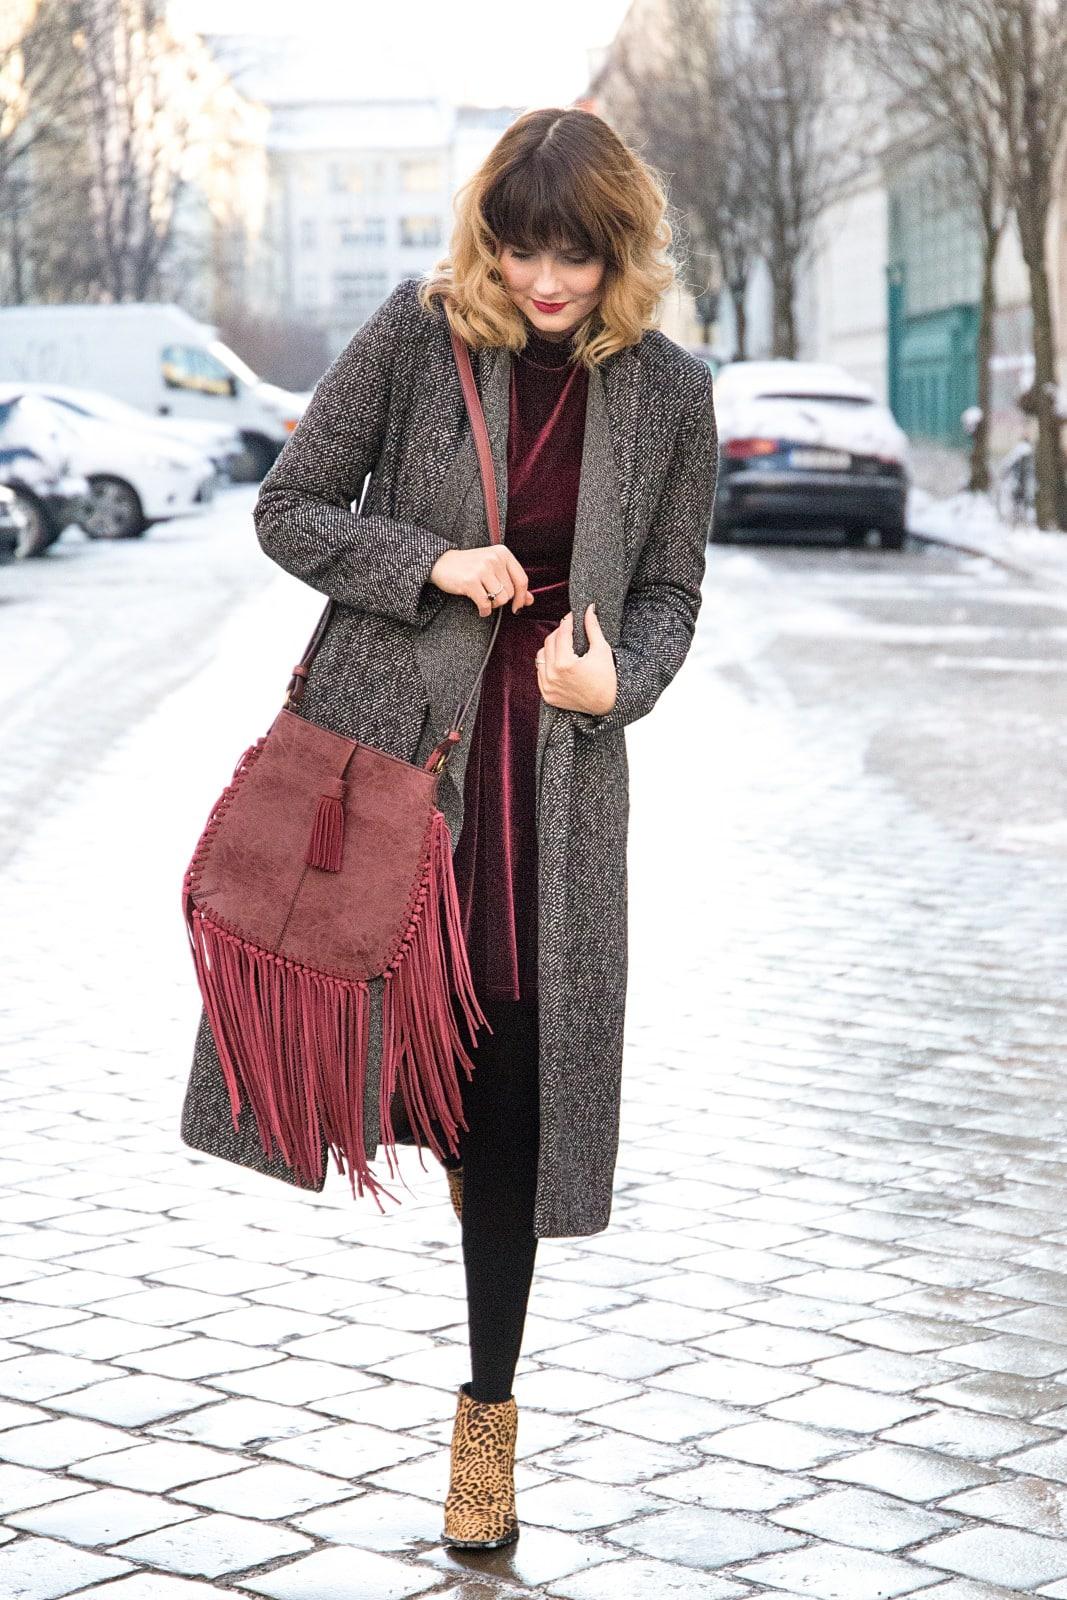 desbelleschoses-fashion-blog-köln-deutschland-berlin-fashion-week-januar-2016-streetstyle-tag-2-samtkleid-leo-boots 5